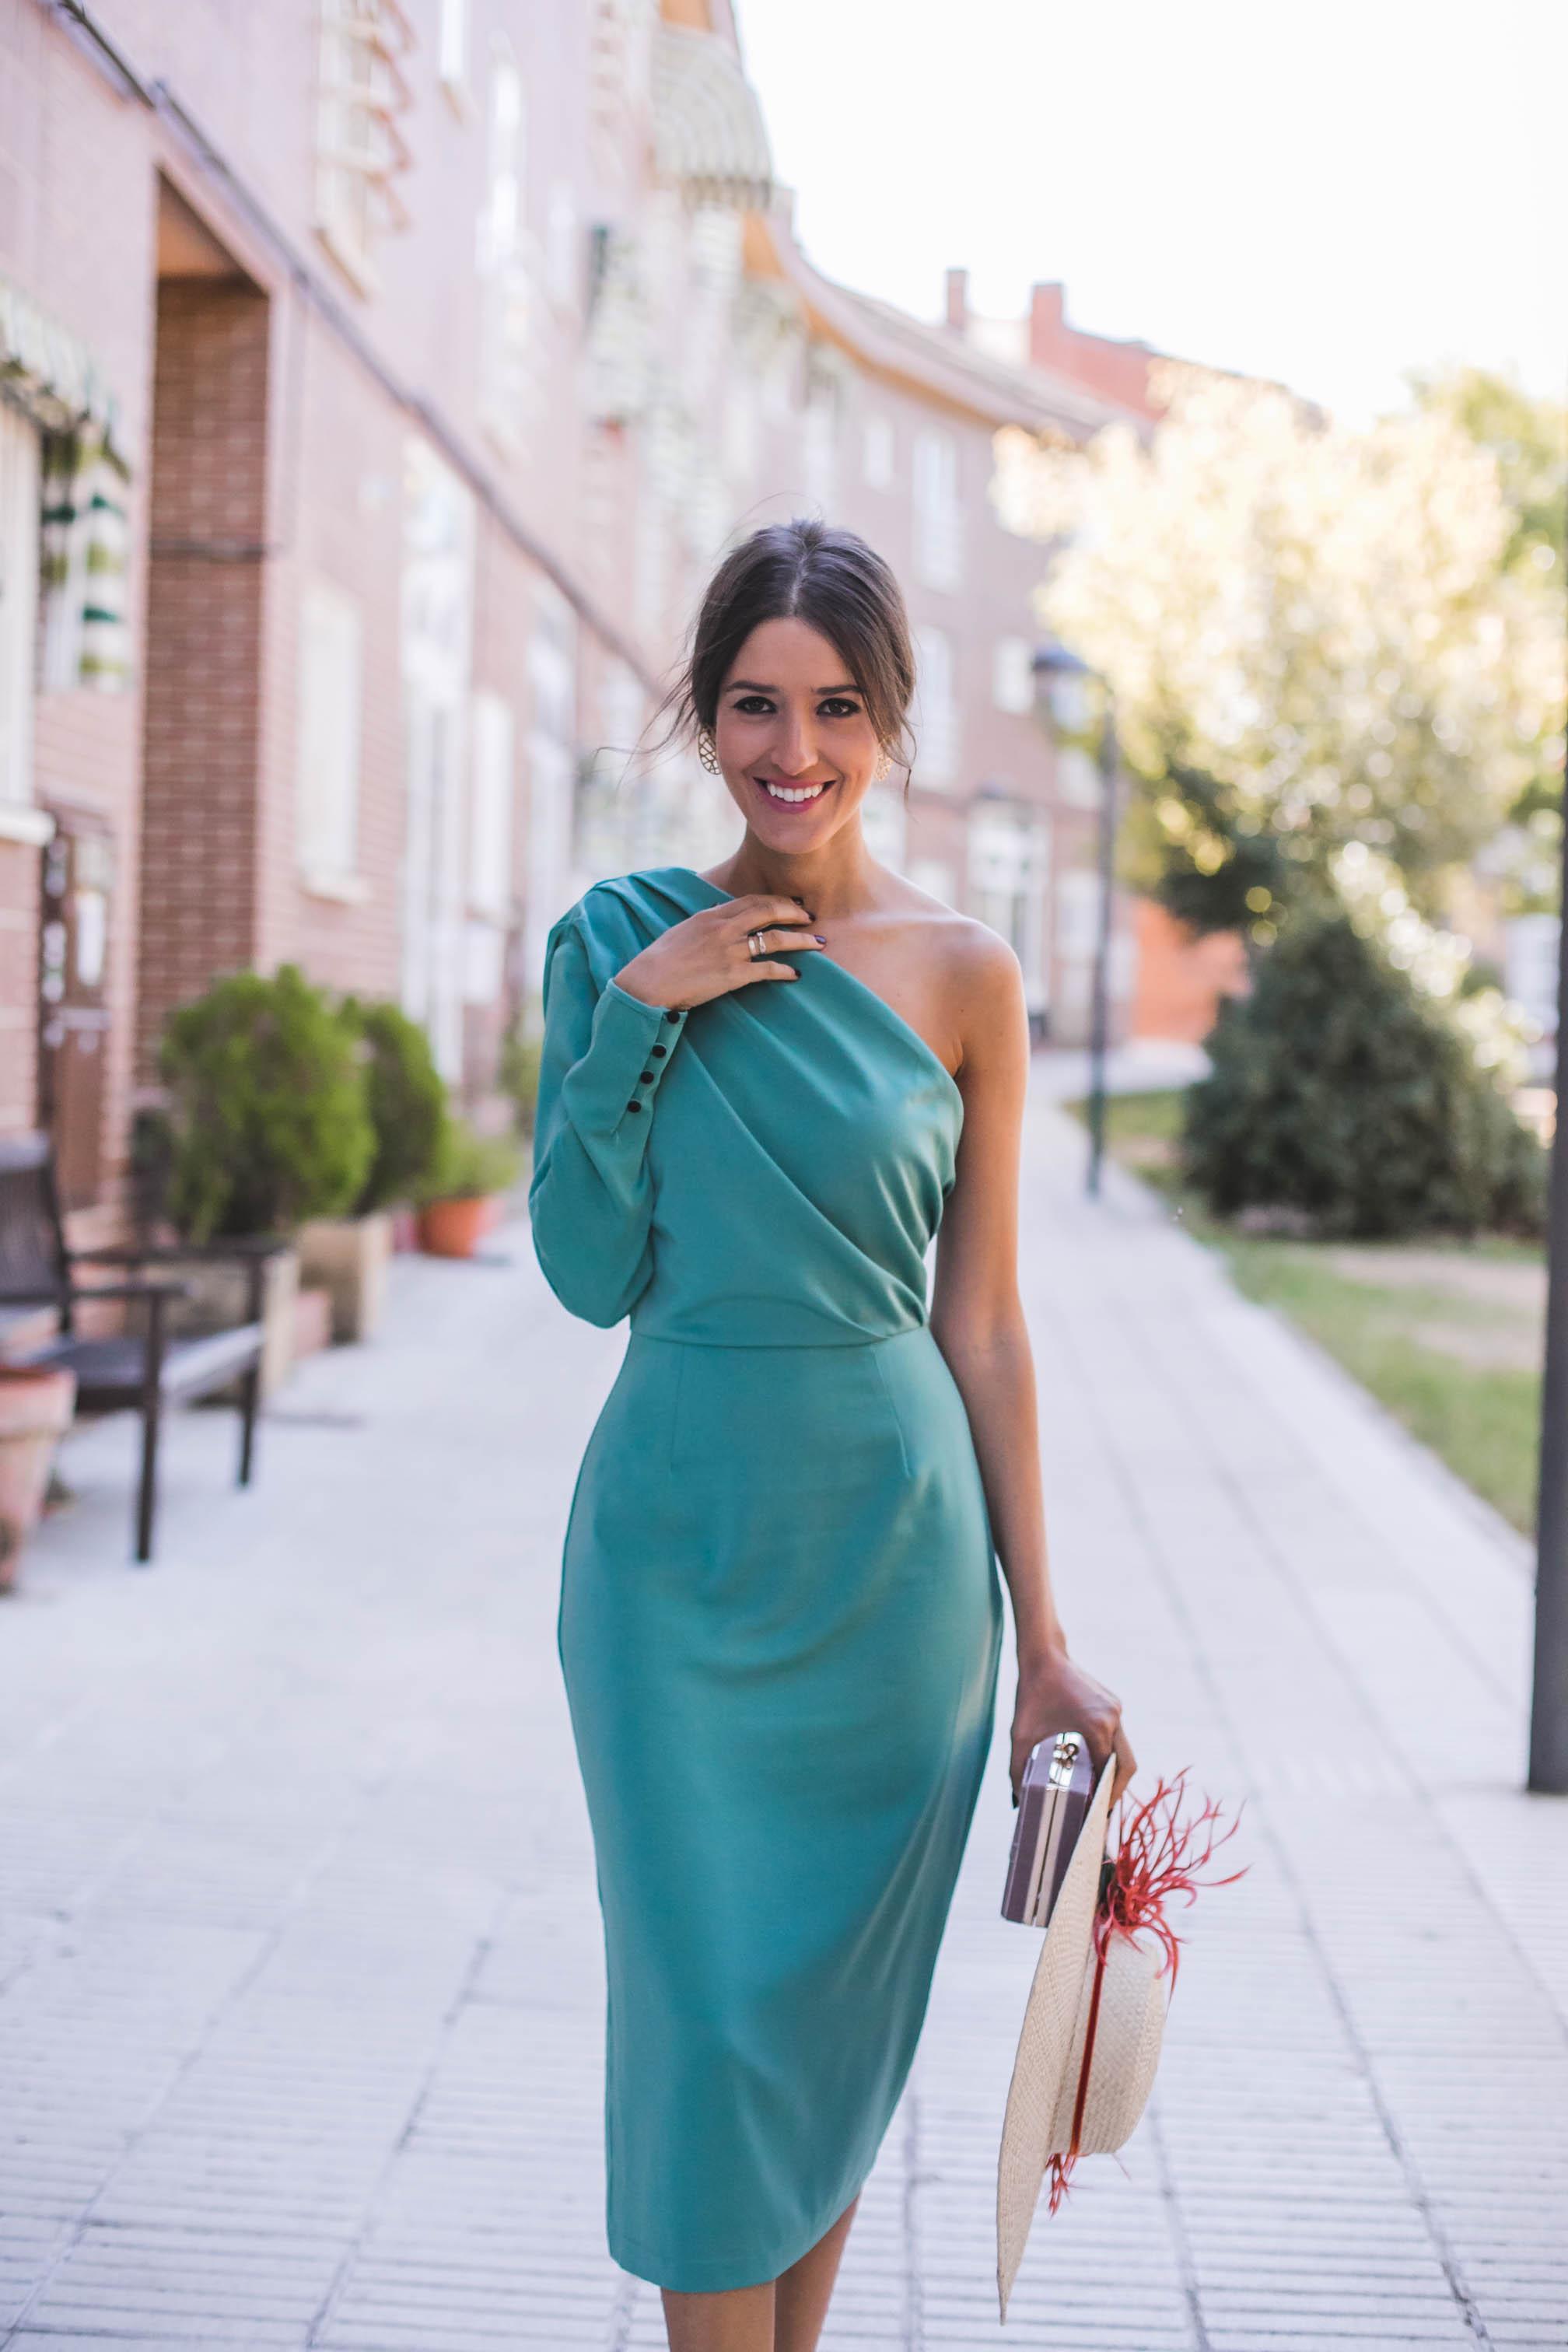 Verde By Asimétrico – Vestido Sandra 11 Perfecta Musgo Bruna Invitada vmnwON80